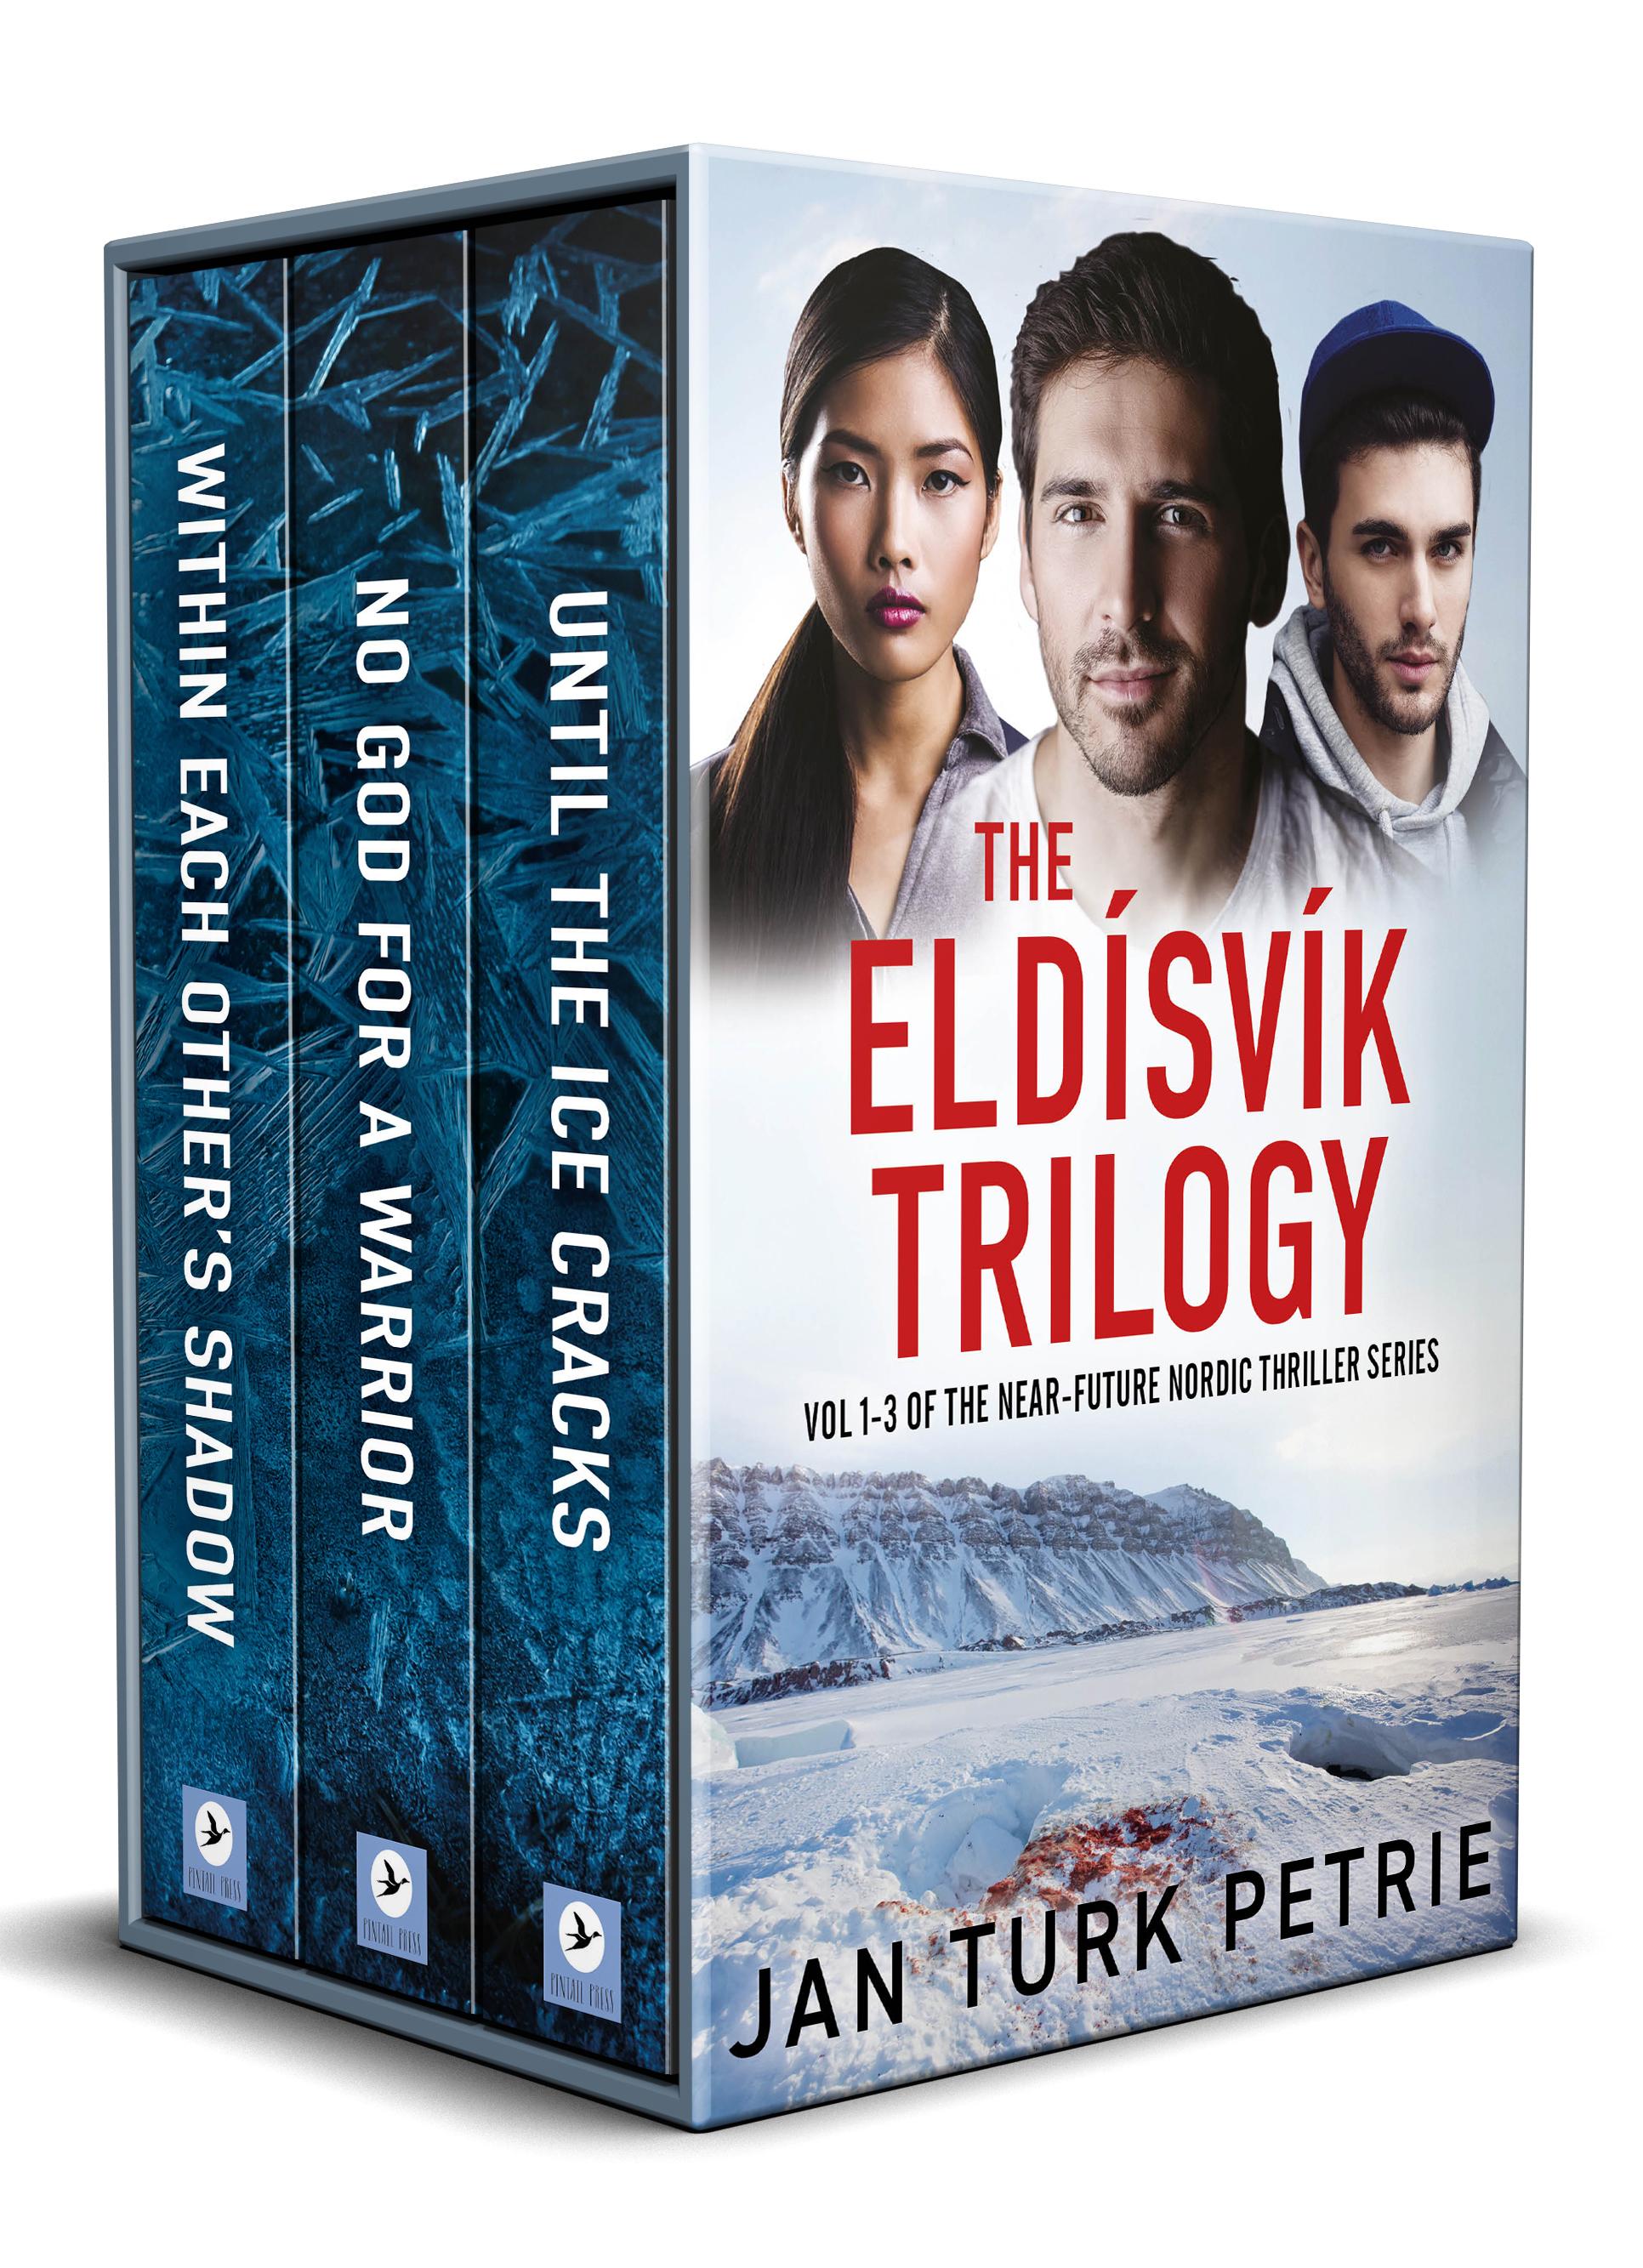 the-eldisvik-trilogy-cover-3d-1